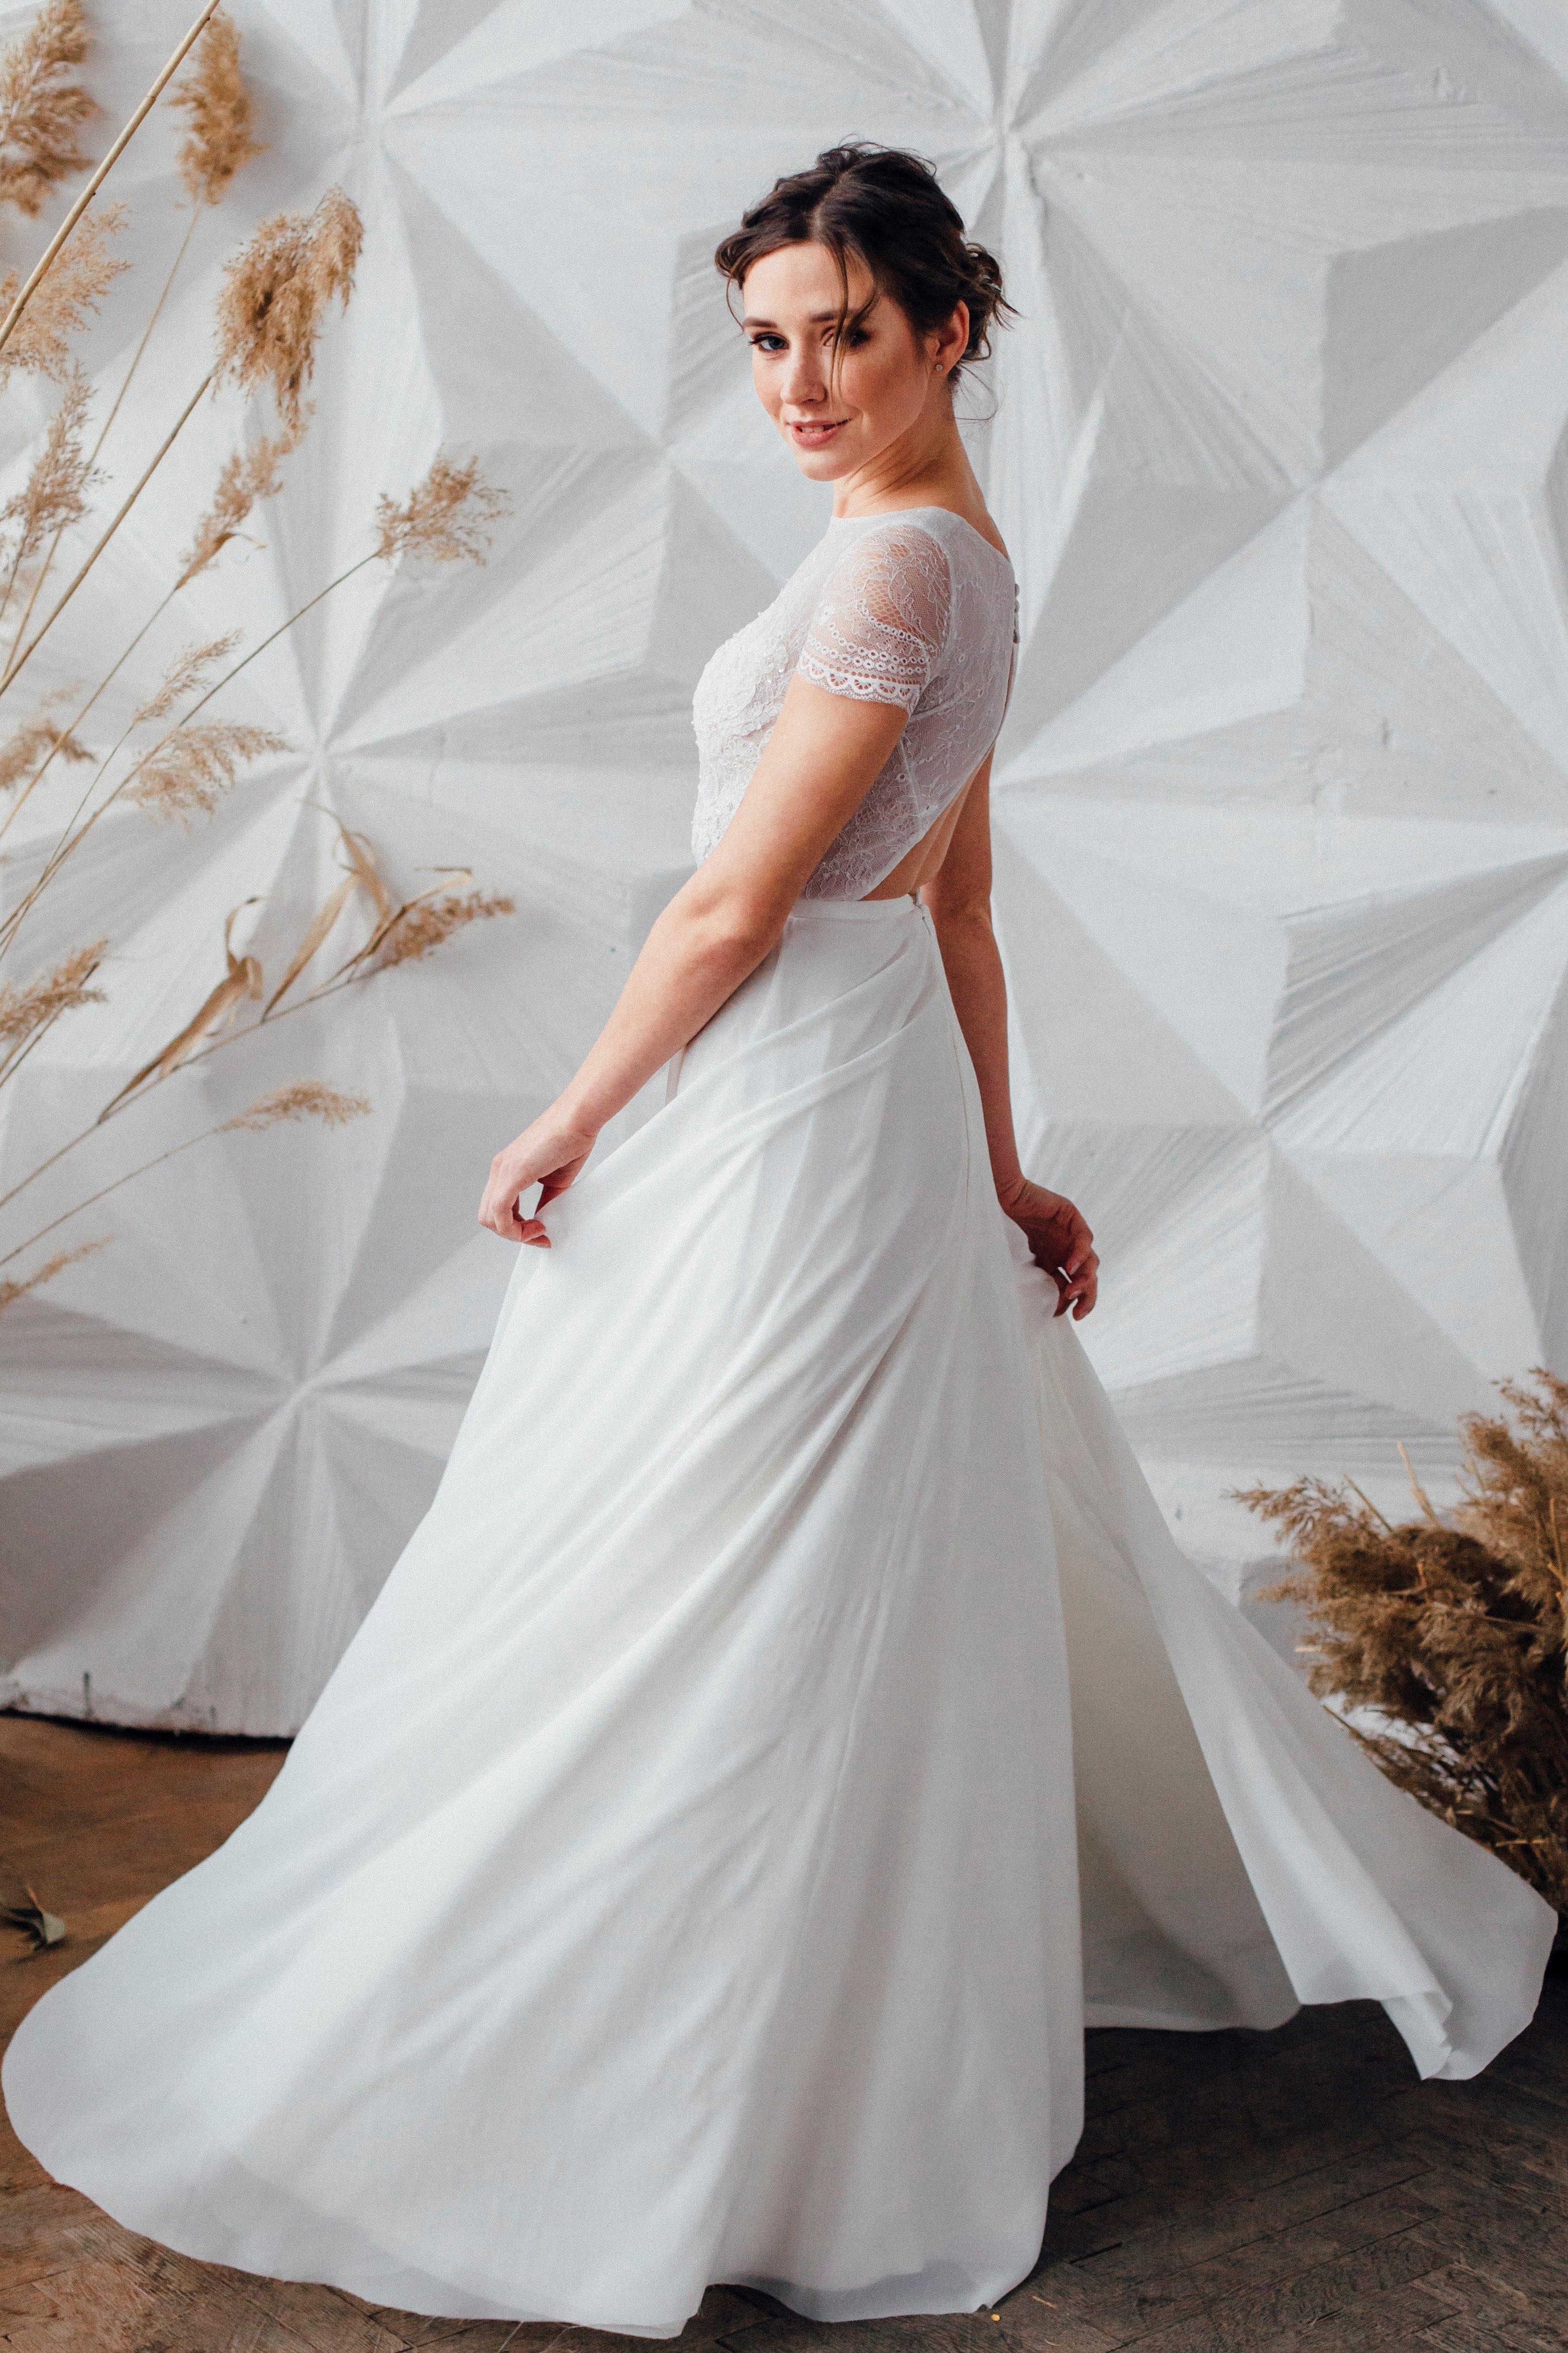 Свадебное платье BOZENA, коллекция MAGIC OF TENDERNESS, бренд LORA SONG, фото 4